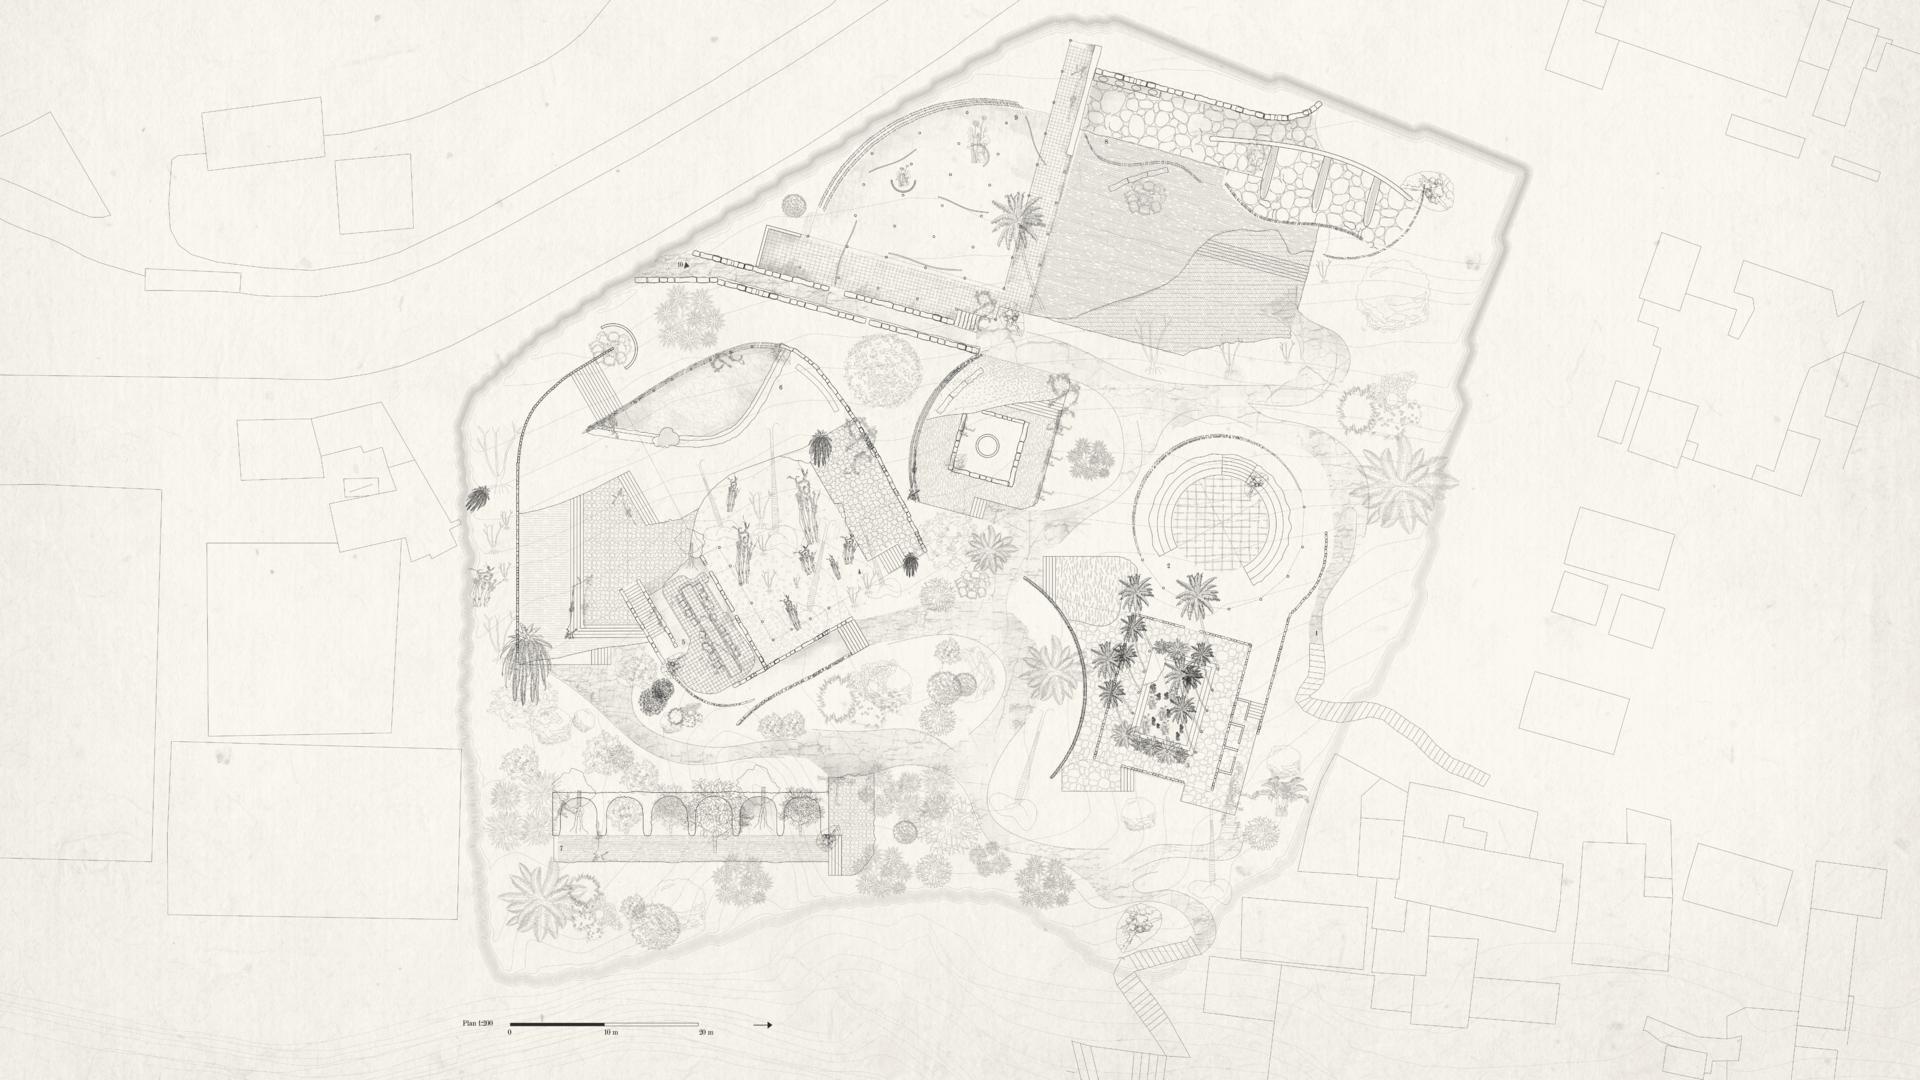 Building Plan 1:200